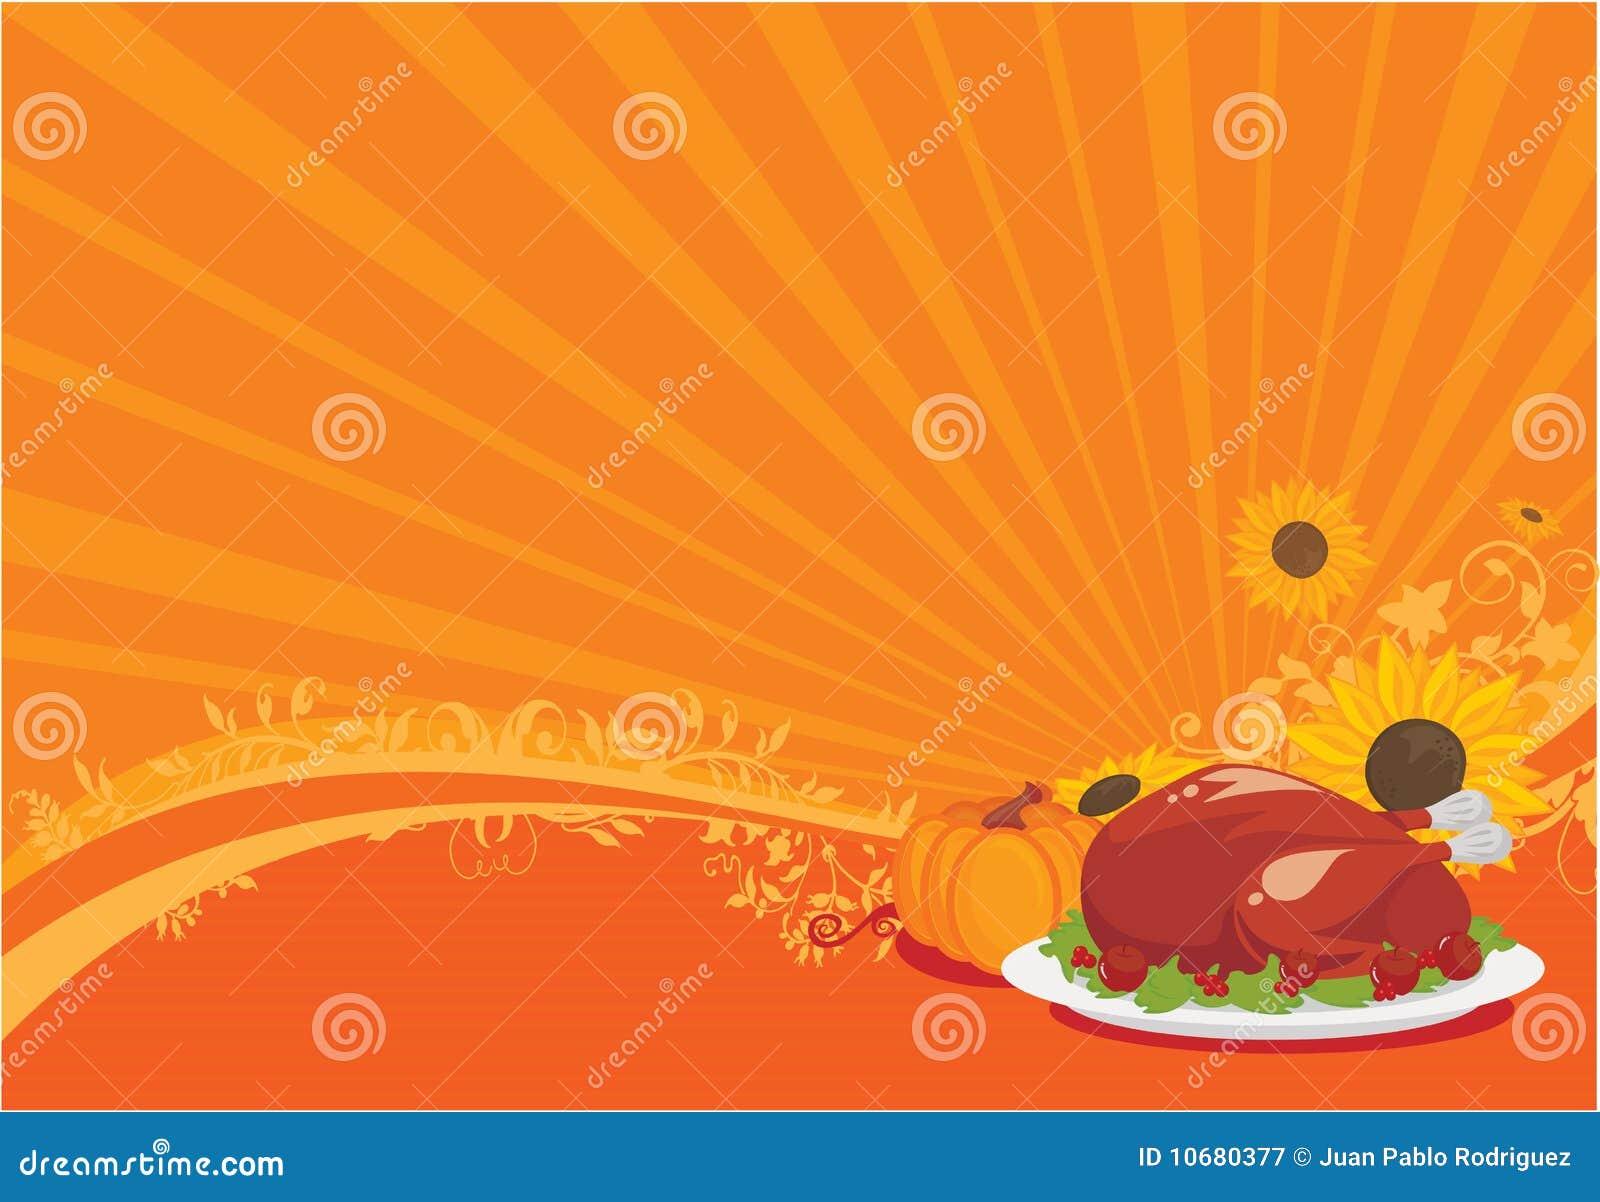 thanksgiving background stock vector illustration of frame 10680377